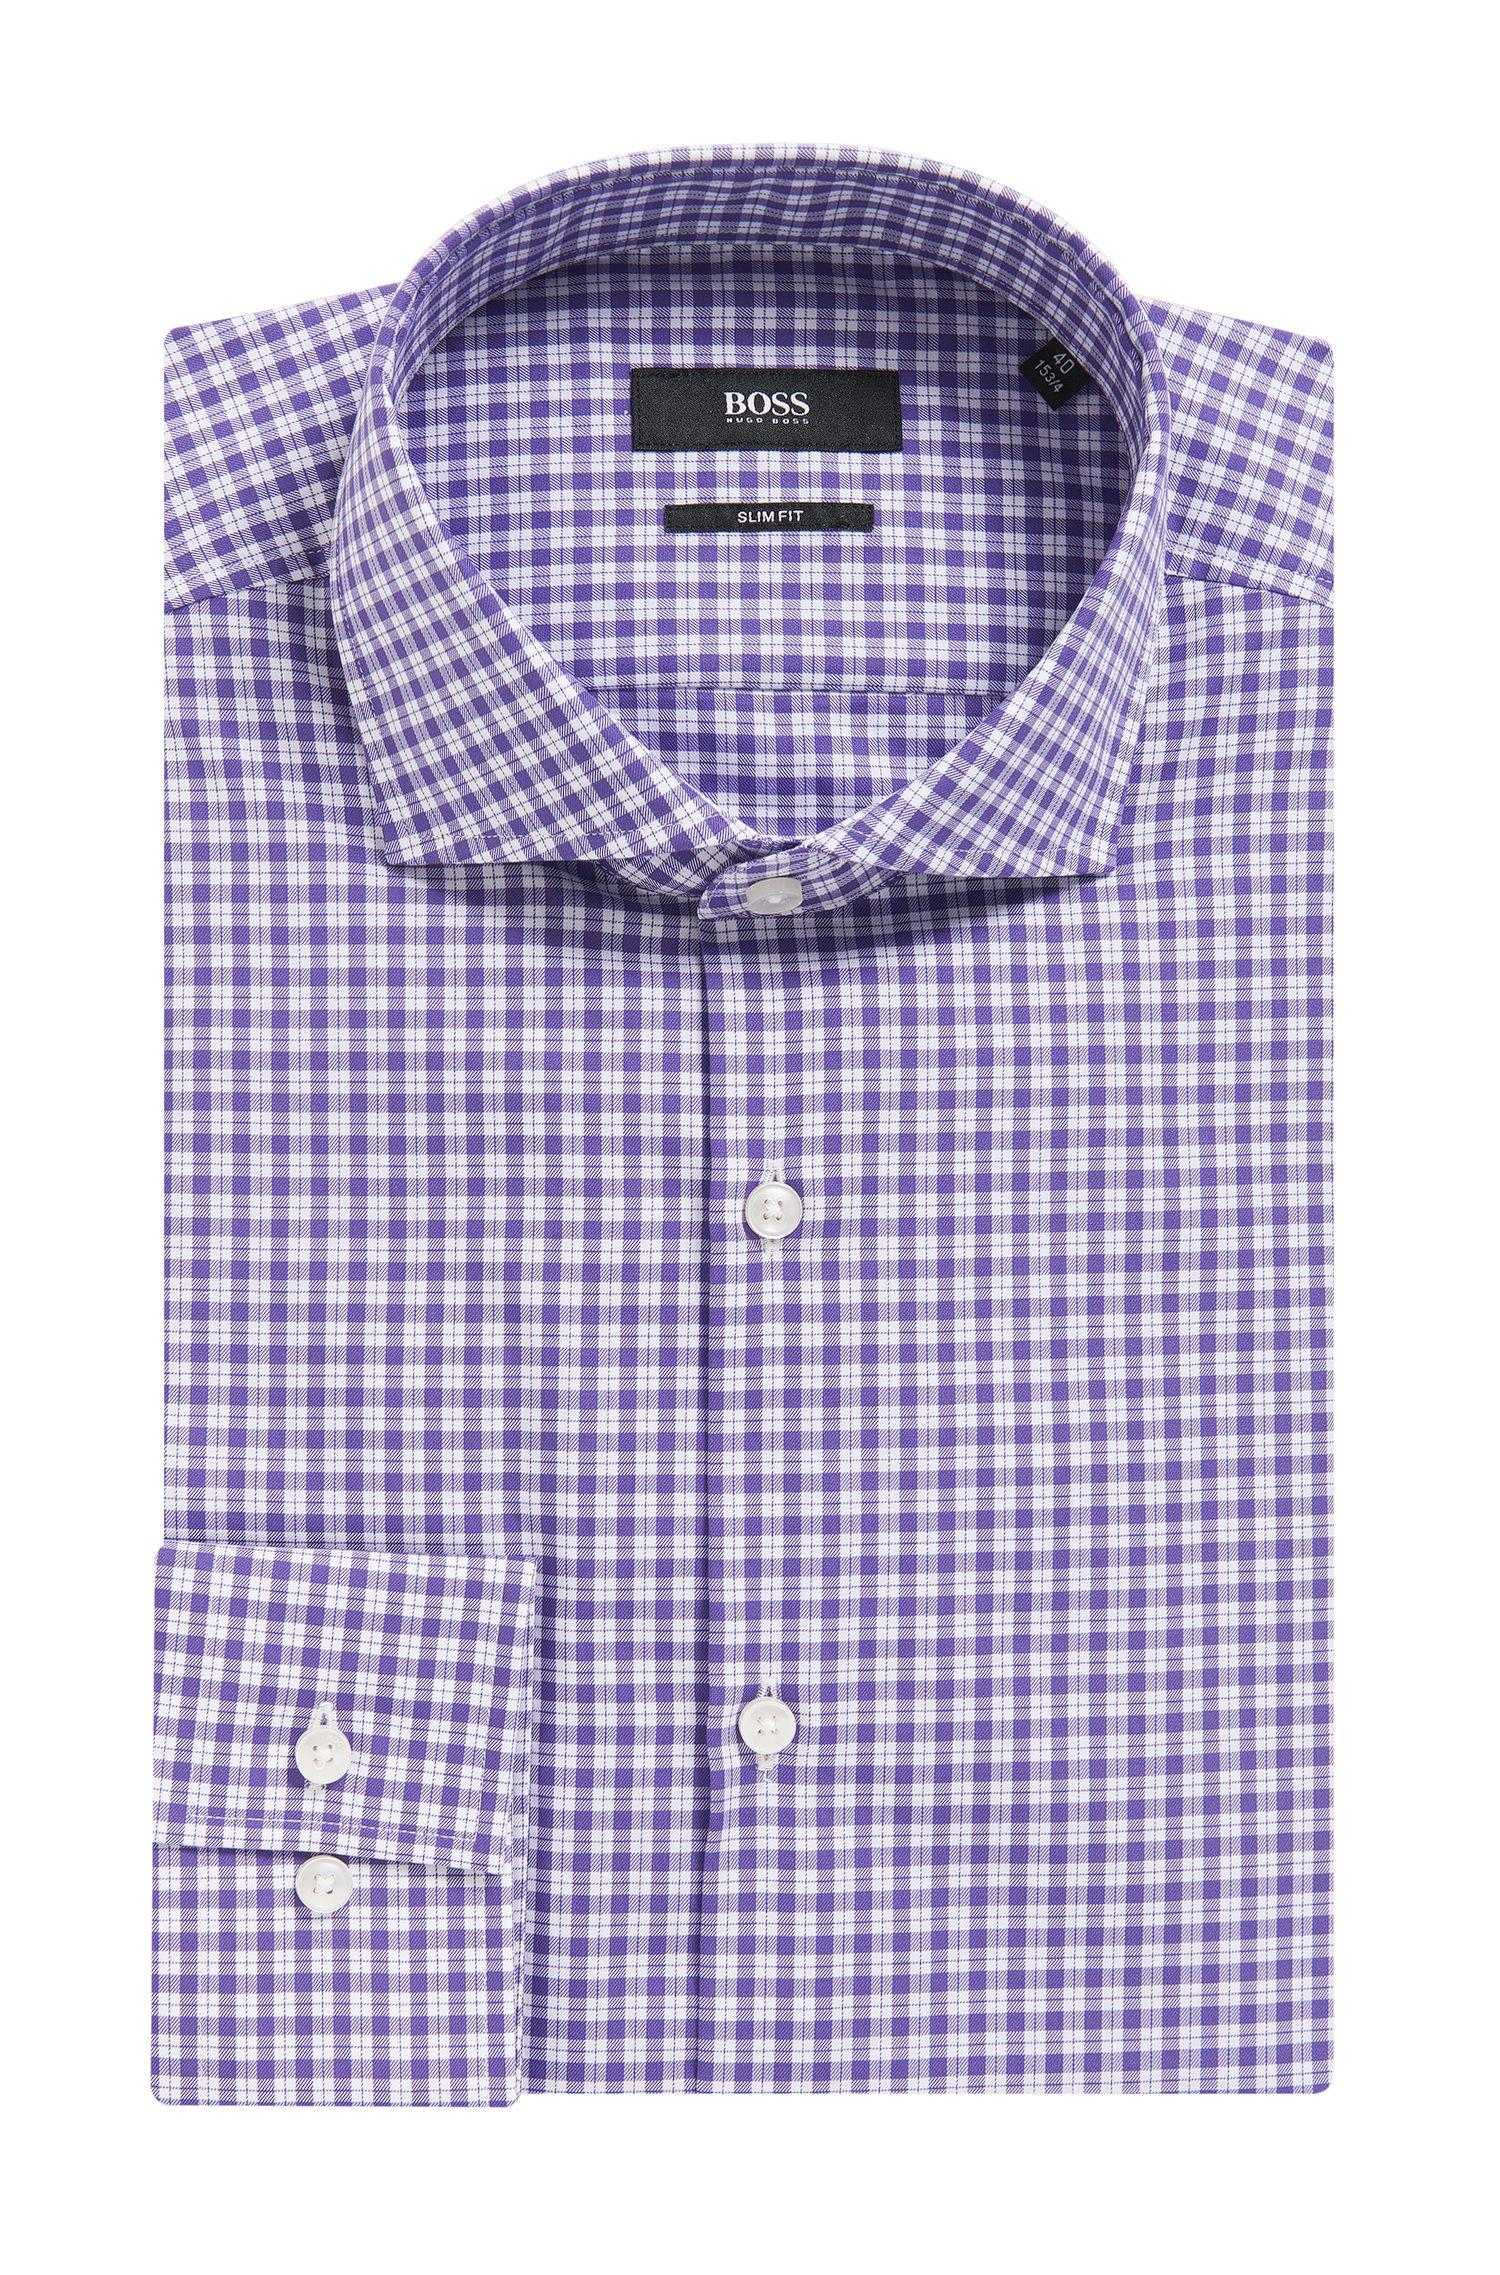 Check Cotton Dress Shirt, Slim Fit | Jason